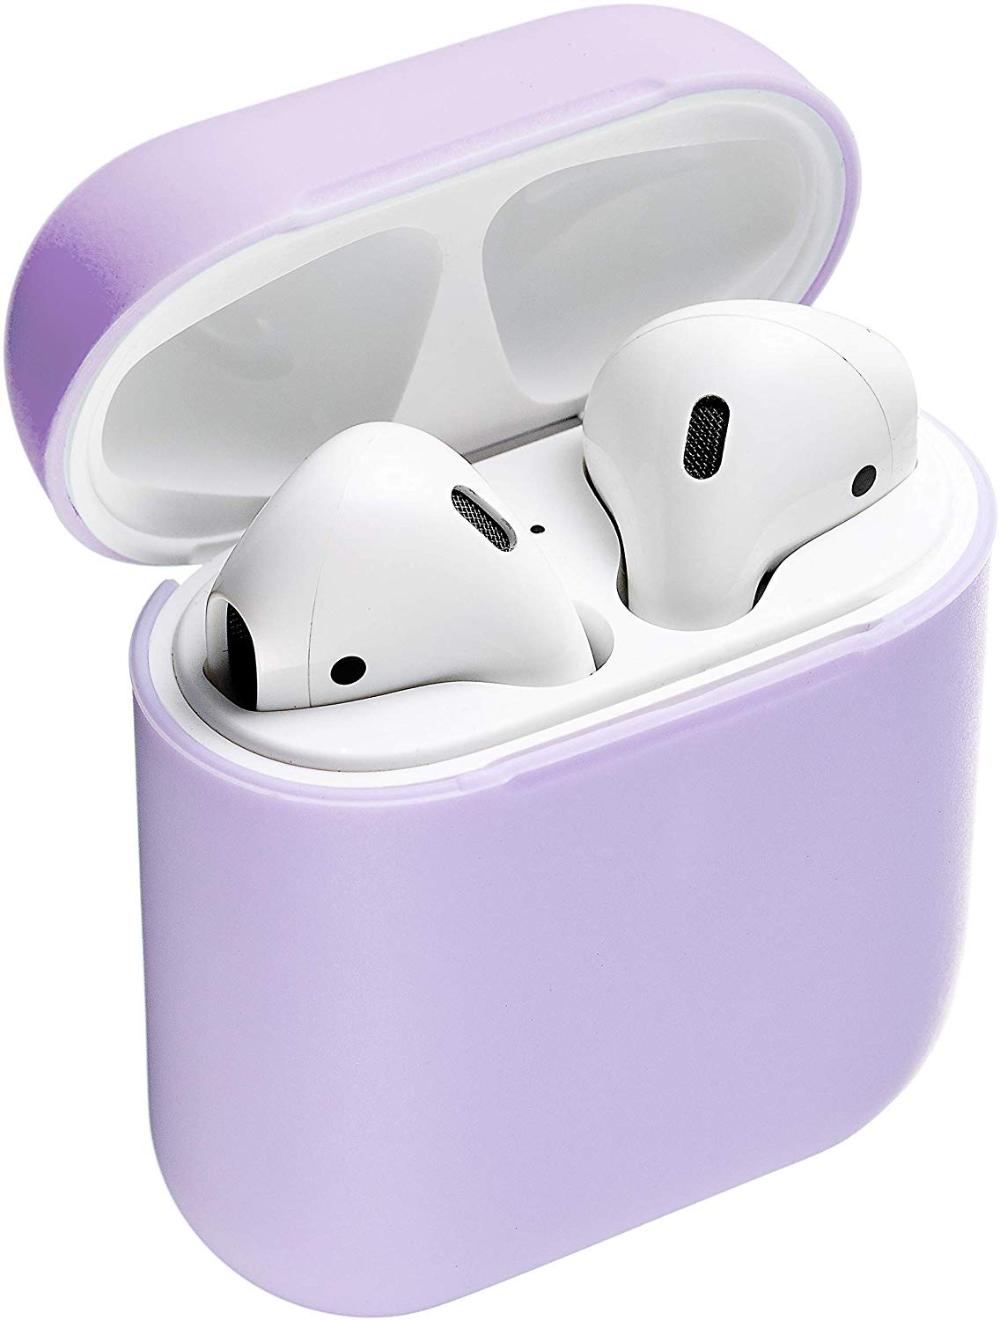 Deppa Lavendel Schutz Ultra Dunne Weiche Premium Light Lila Airpods Kasten Silikon Abdeckung Ohne Cute Ipod Cases Purple Cases Airpod Case